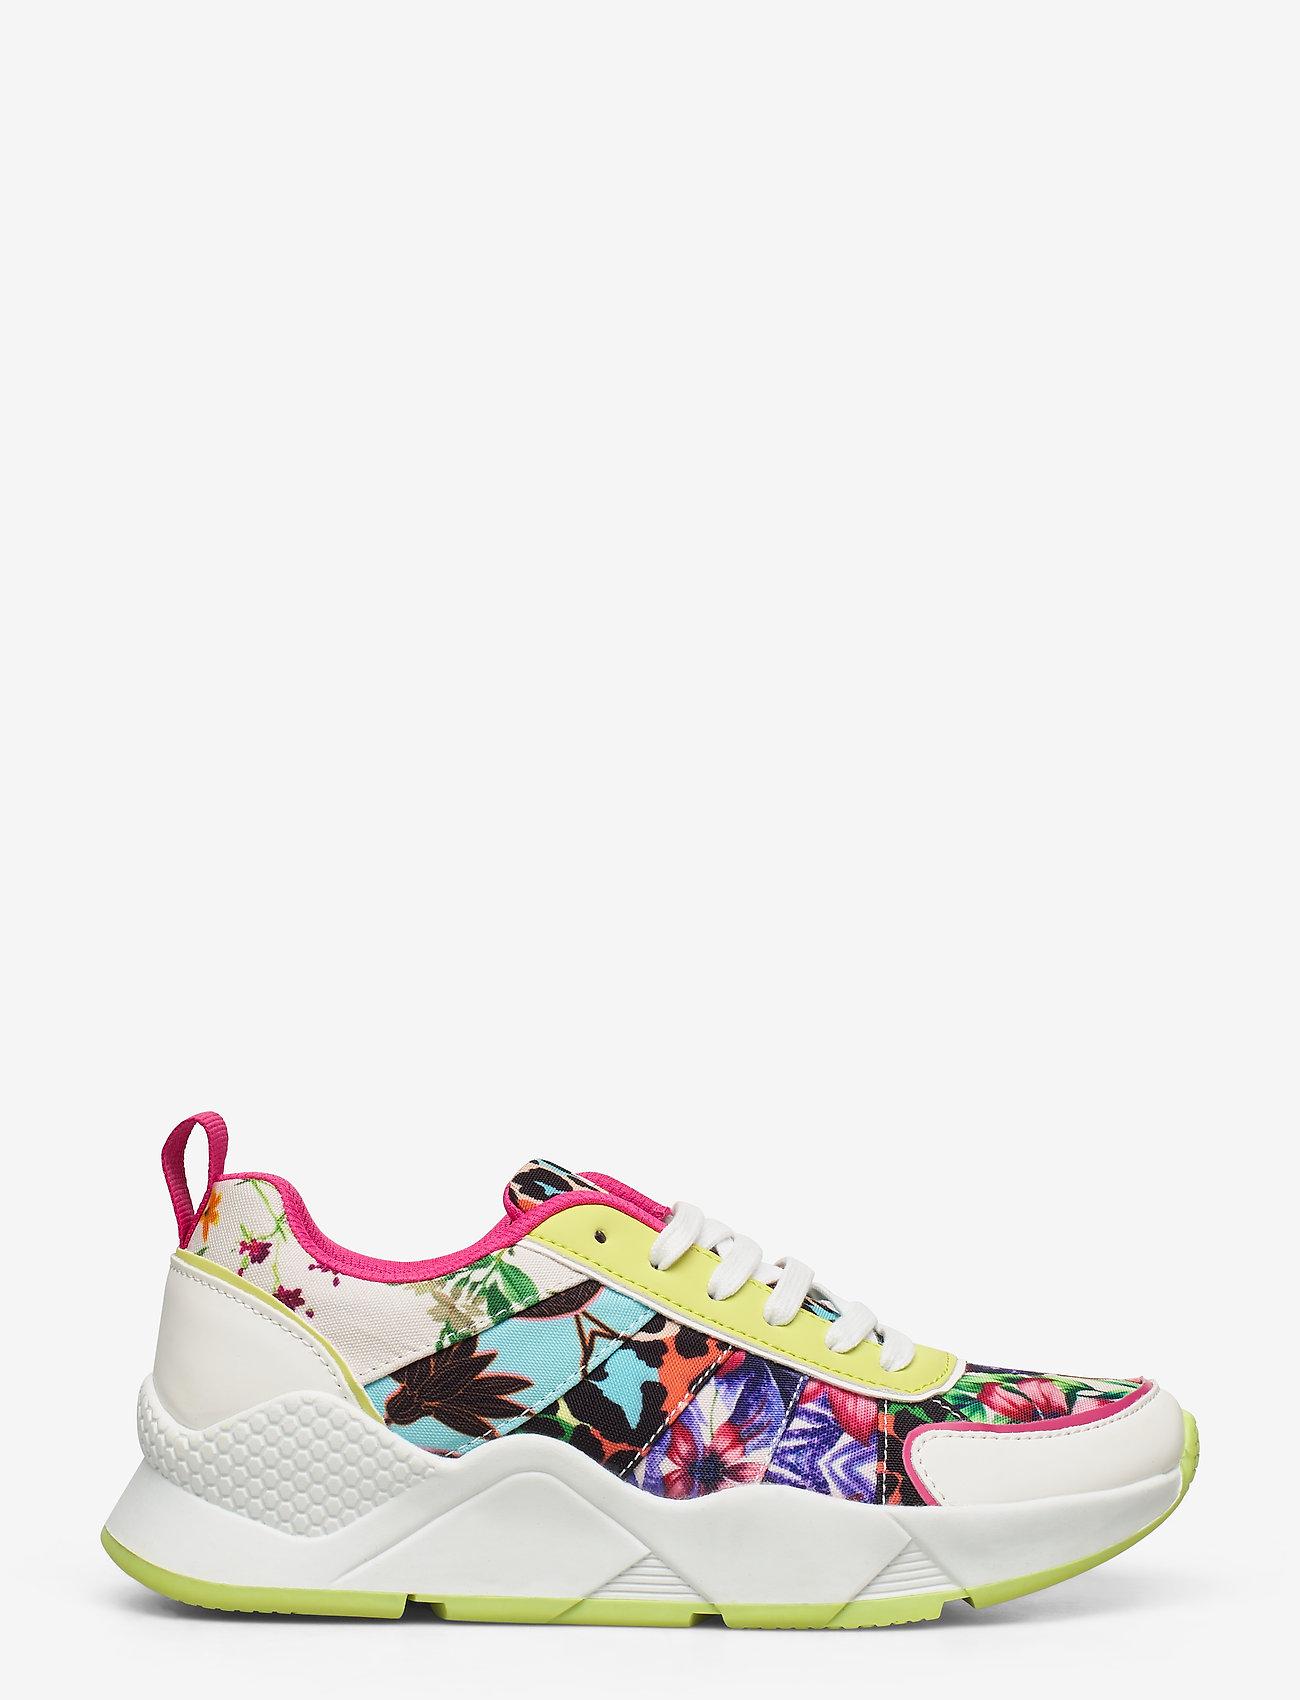 Shoes Hydra Leopard (Lima) (54.98